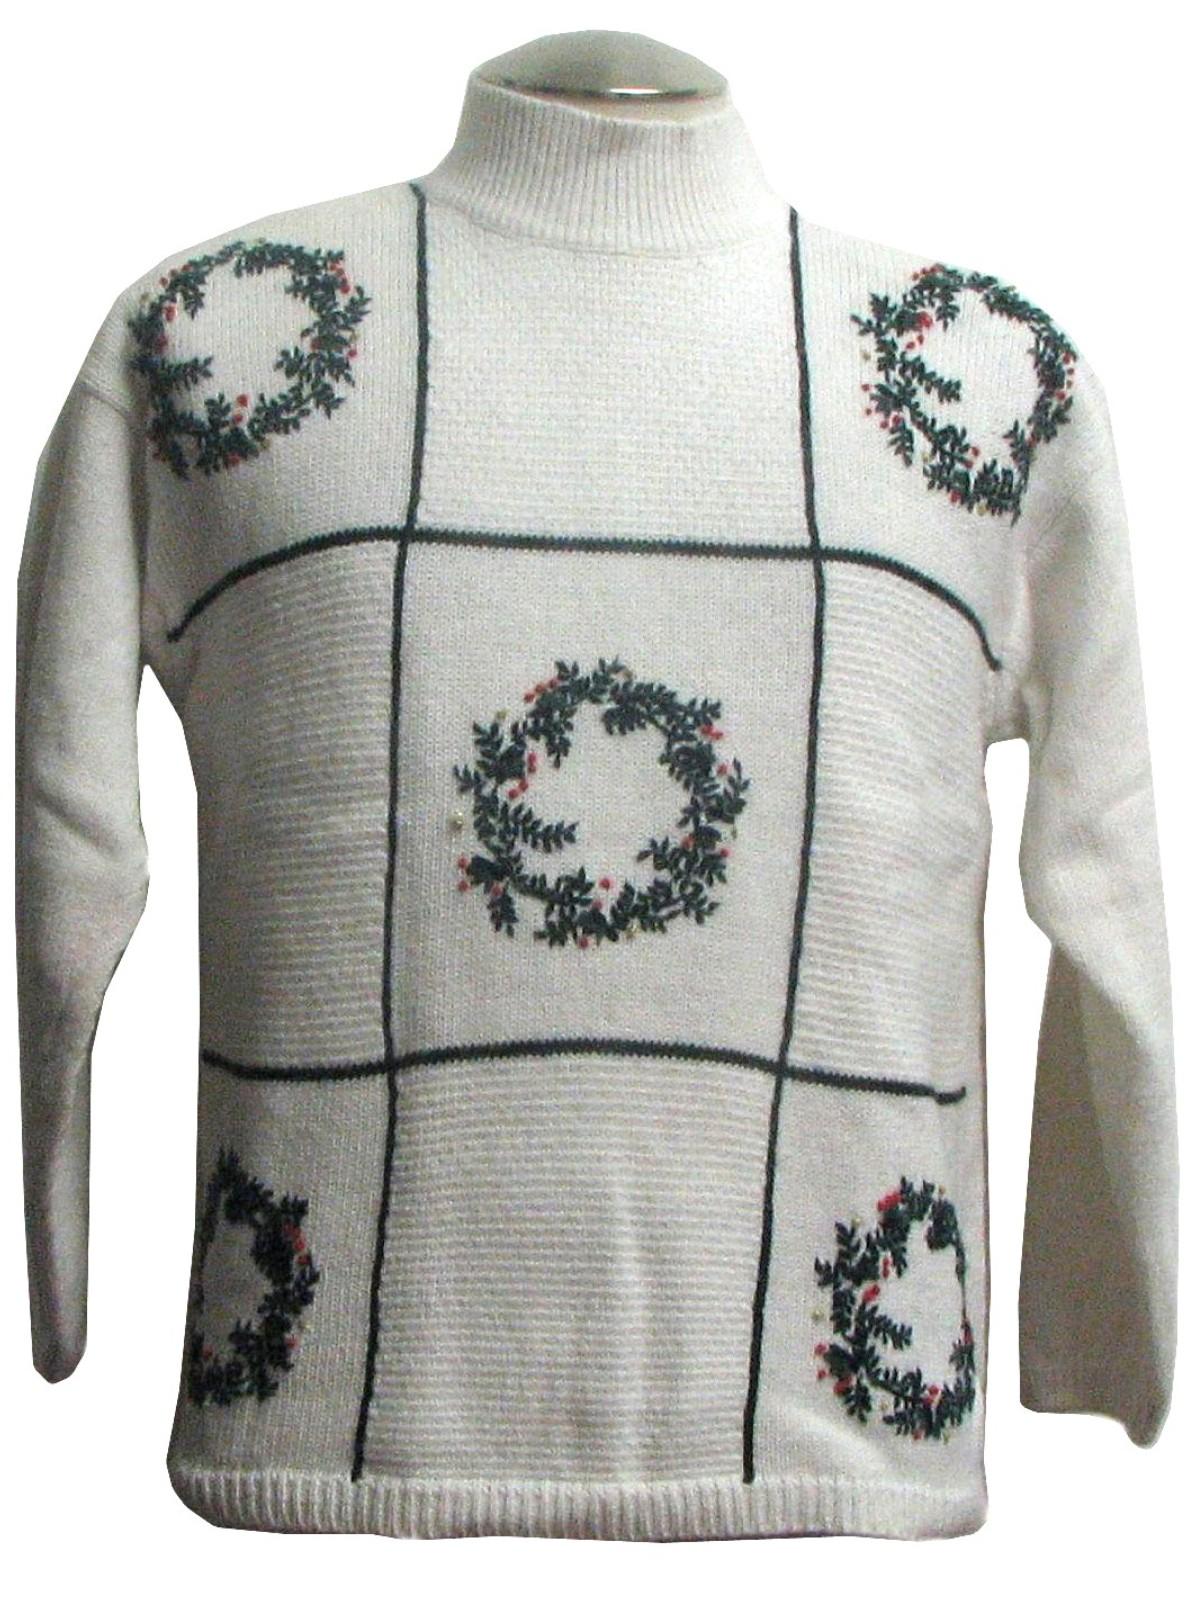 Womens Ugly Christmas Sweater: -Milano- Womens white ramie cotton ...